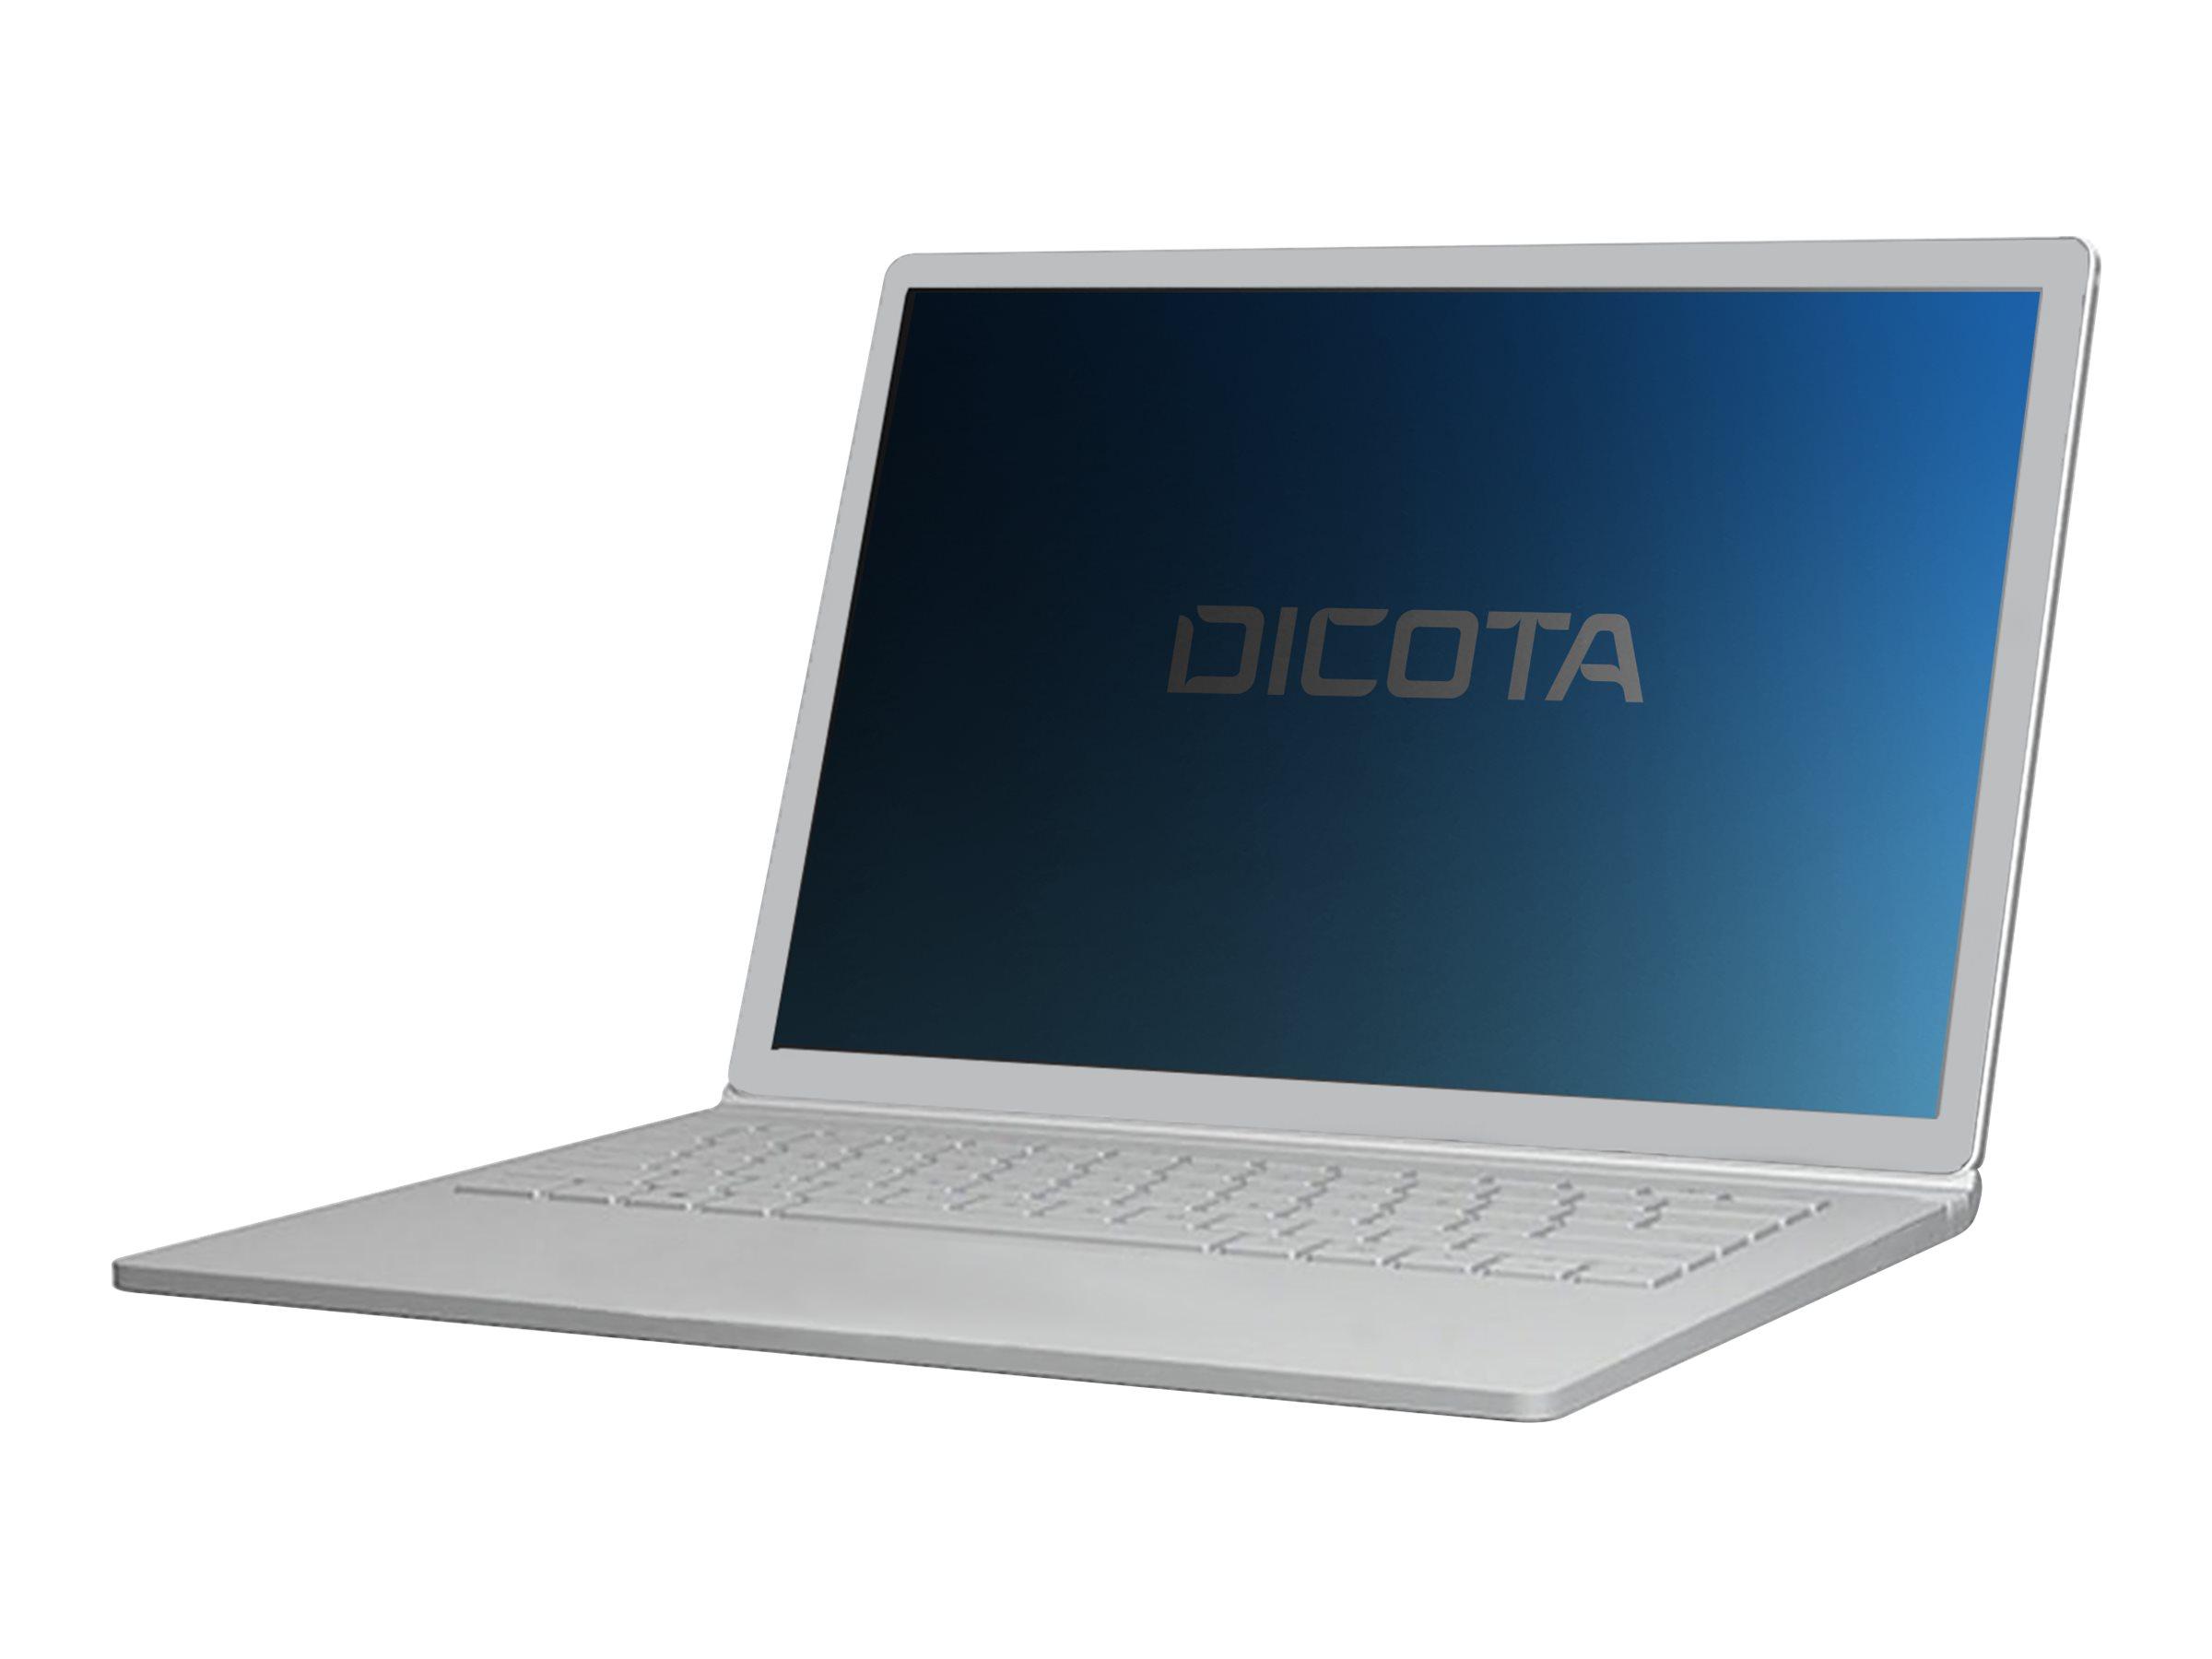 Vorschau: Dicota Blickschutzfilter für Notebook - 4-Wege